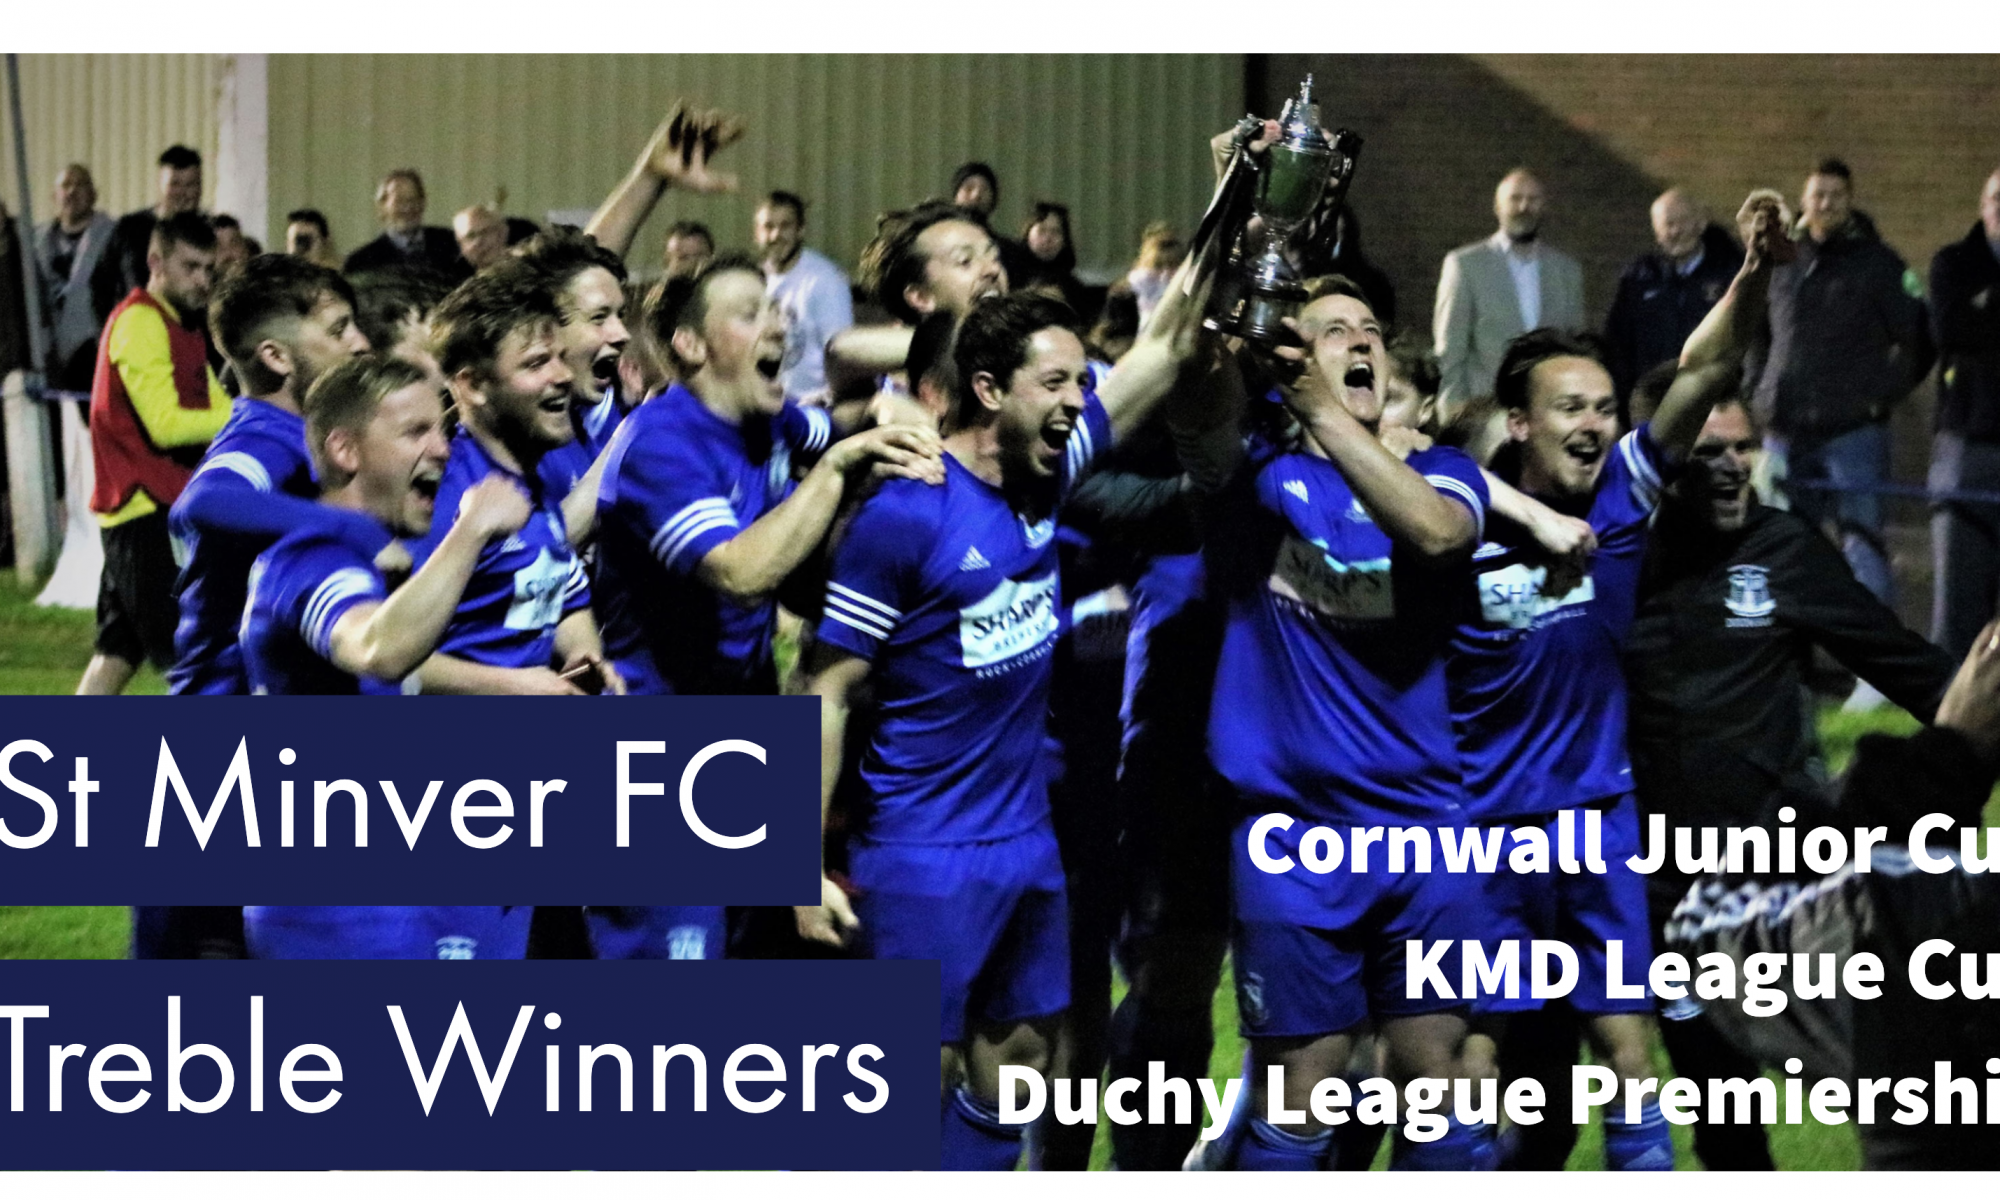 St Minver FC - Treble Winners 2016/17